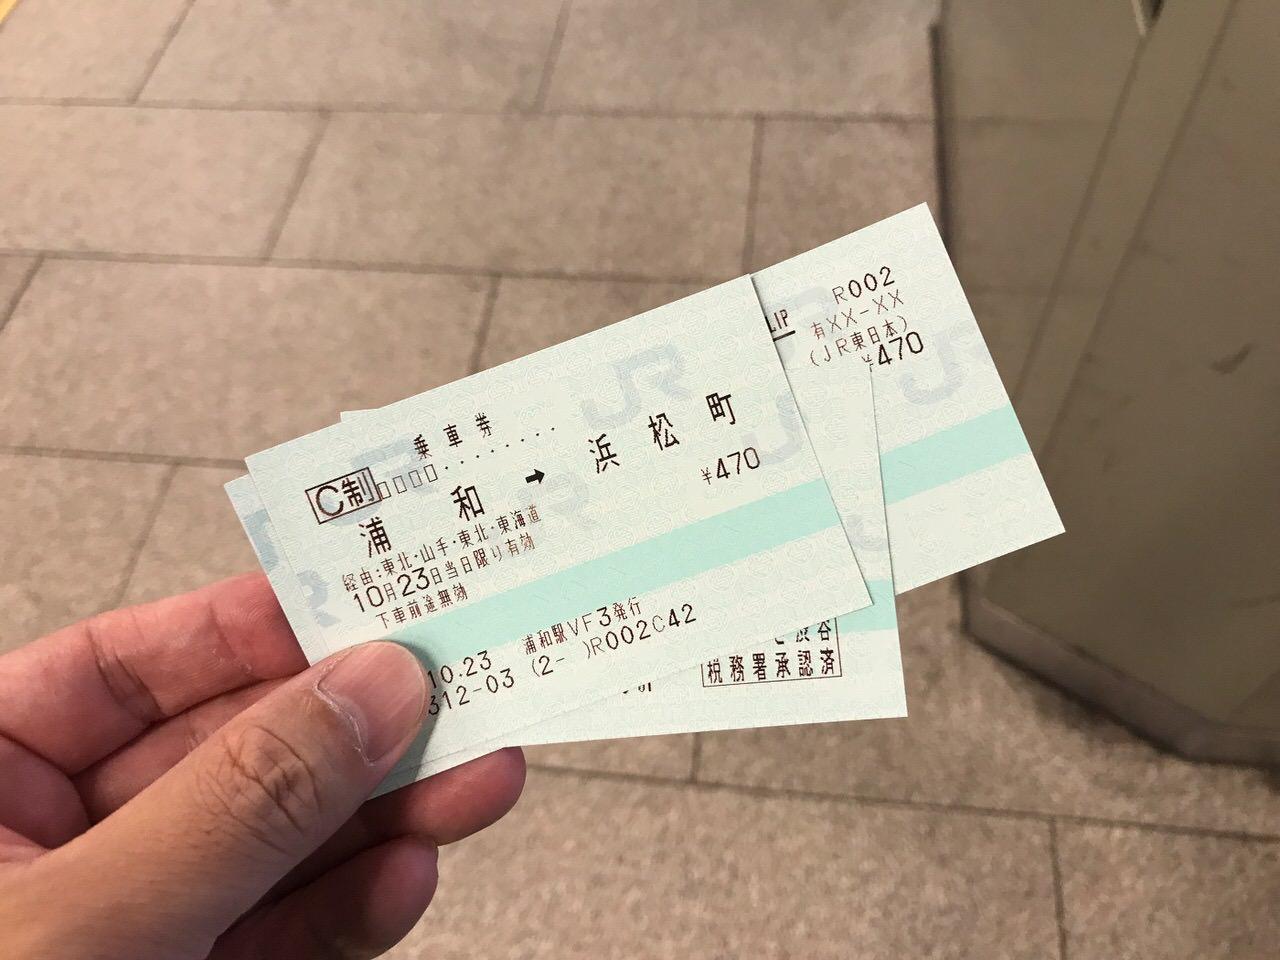 Jr creditcard ticket 9404